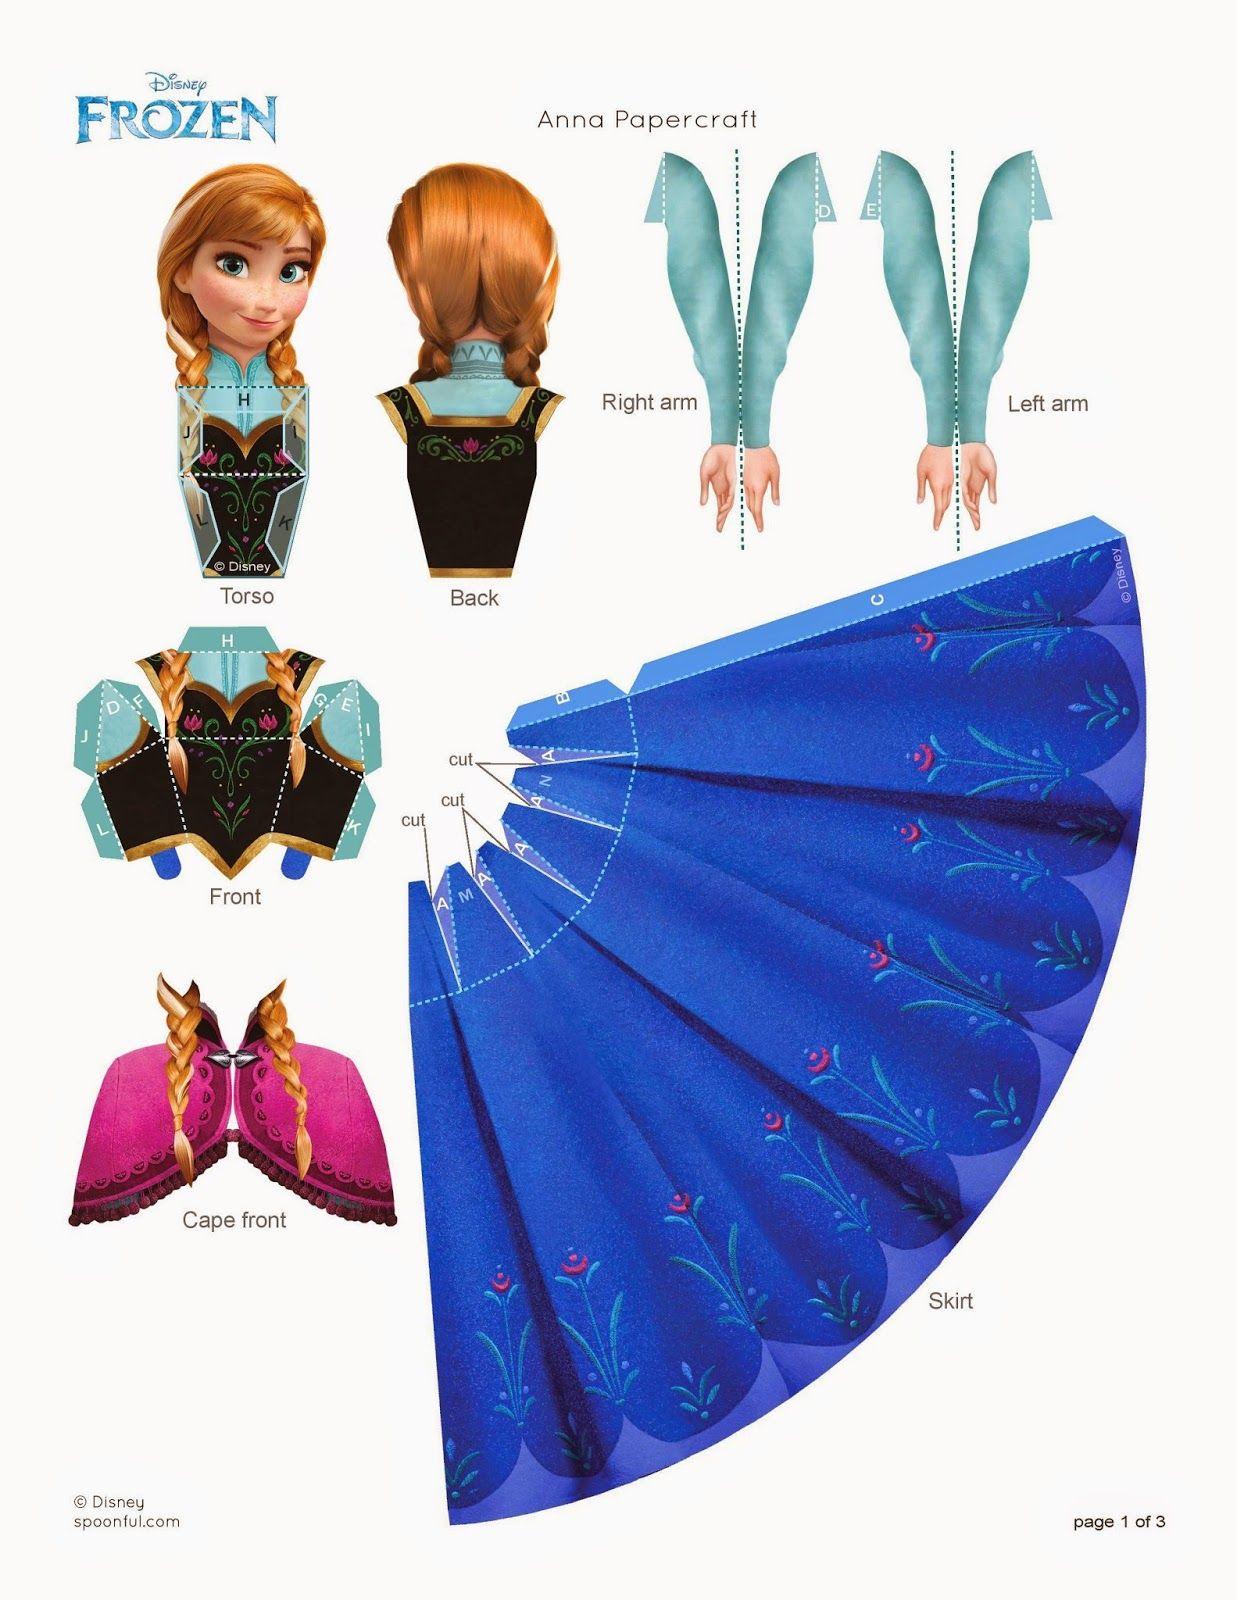 Canguro sofá intervalo  Juegos para vestir juguetes: febrero 2015 | Manualidades disney,  Imprimibles de frozen, Manualidades